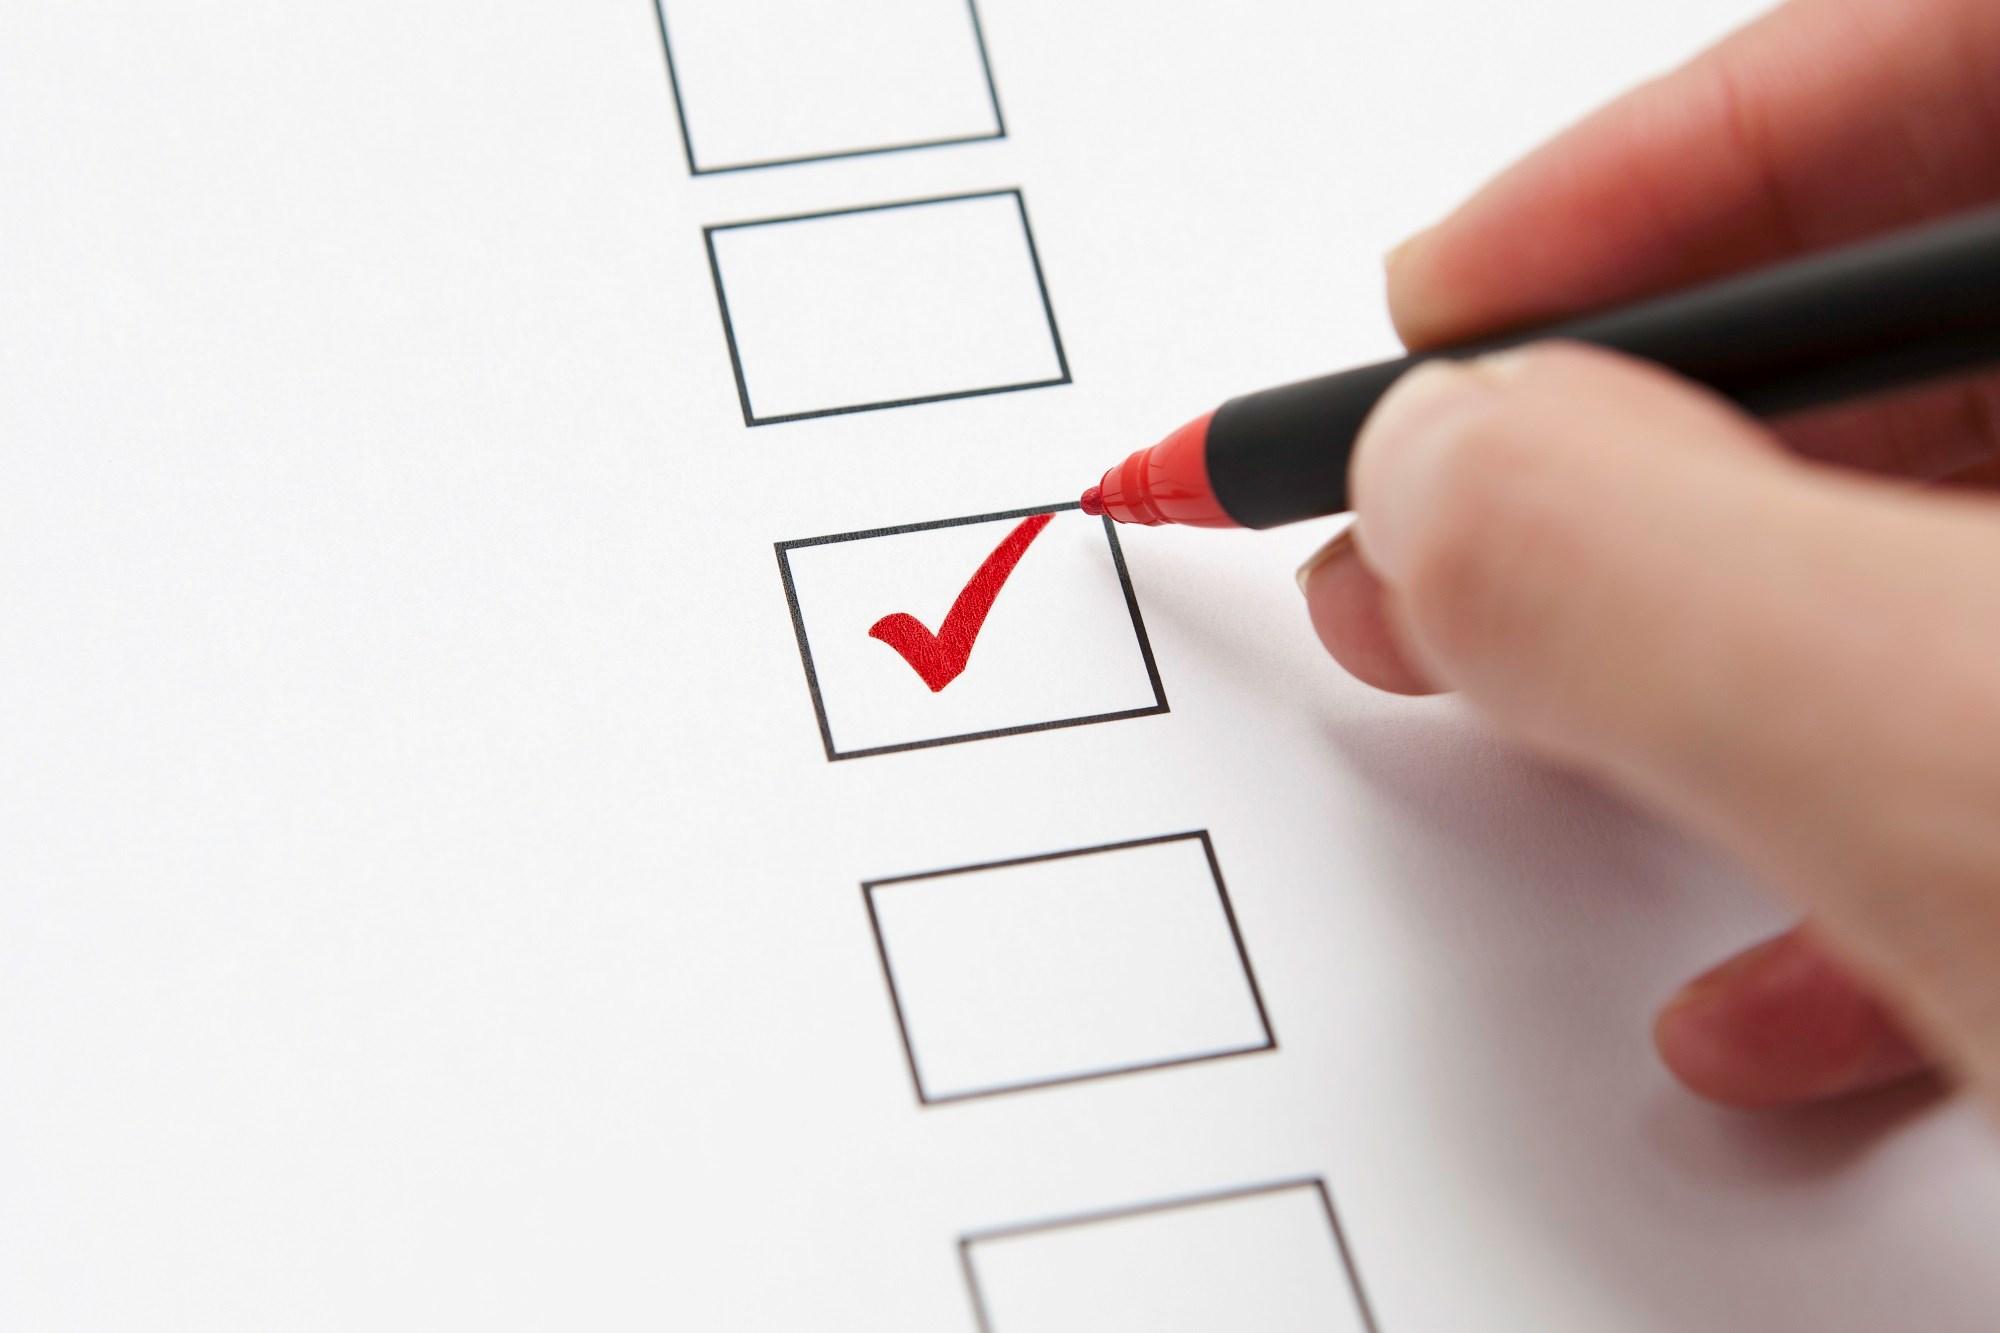 Self-Report Cognitive Questionnaires Predict Work Improvement in Depression